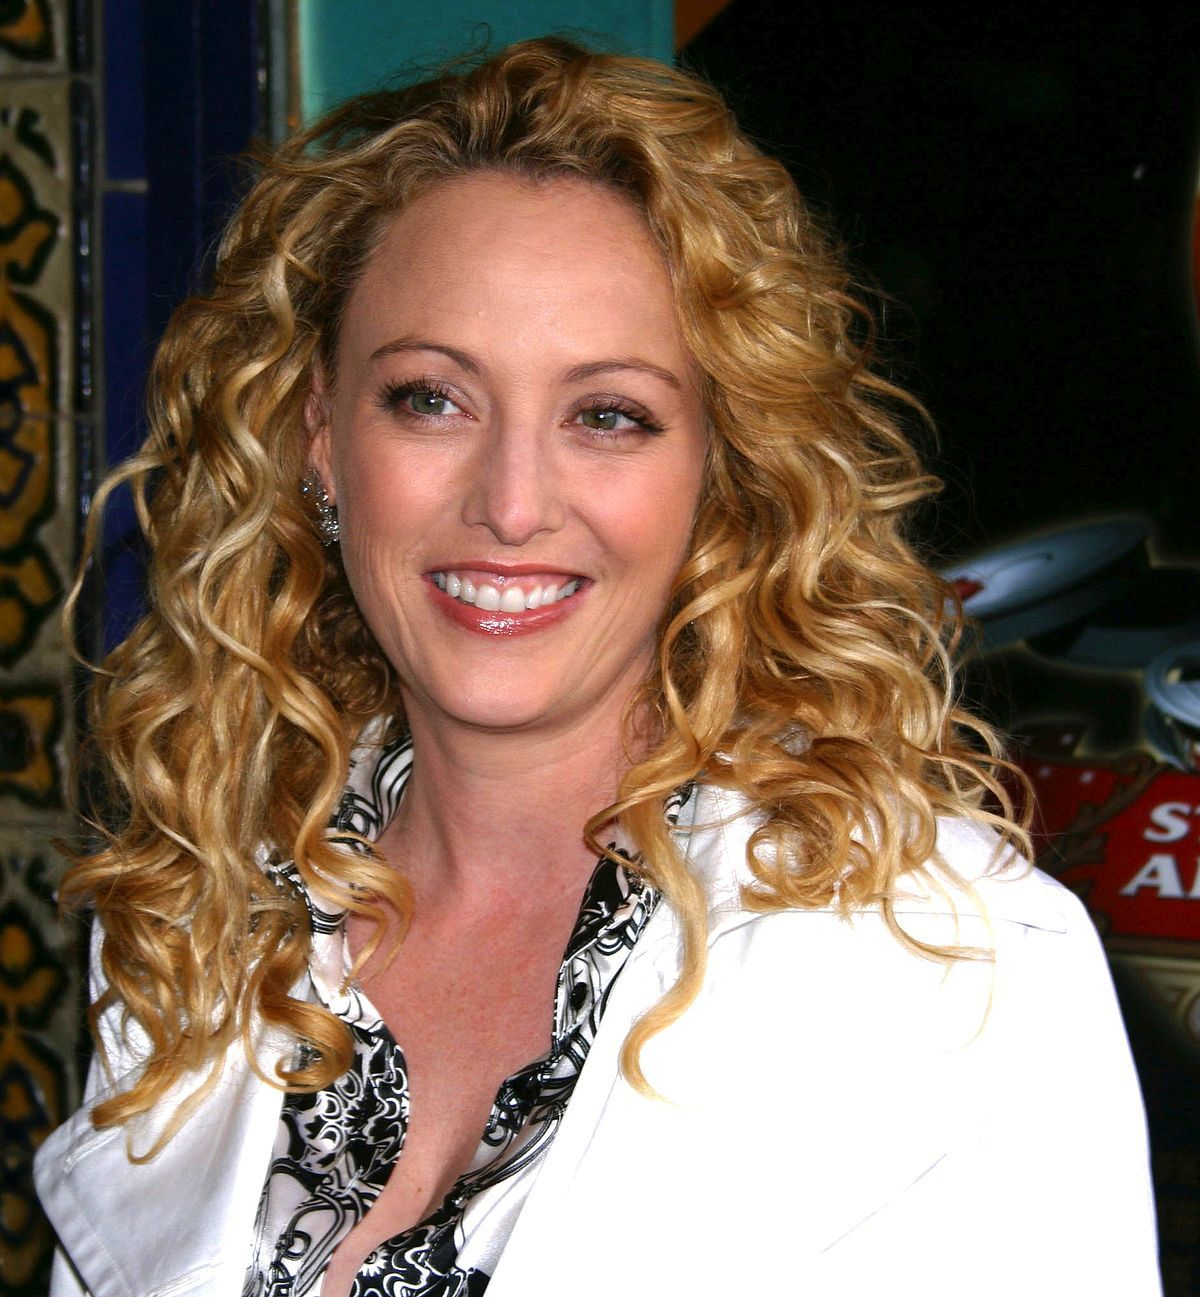 Ariane Bellamar Bio